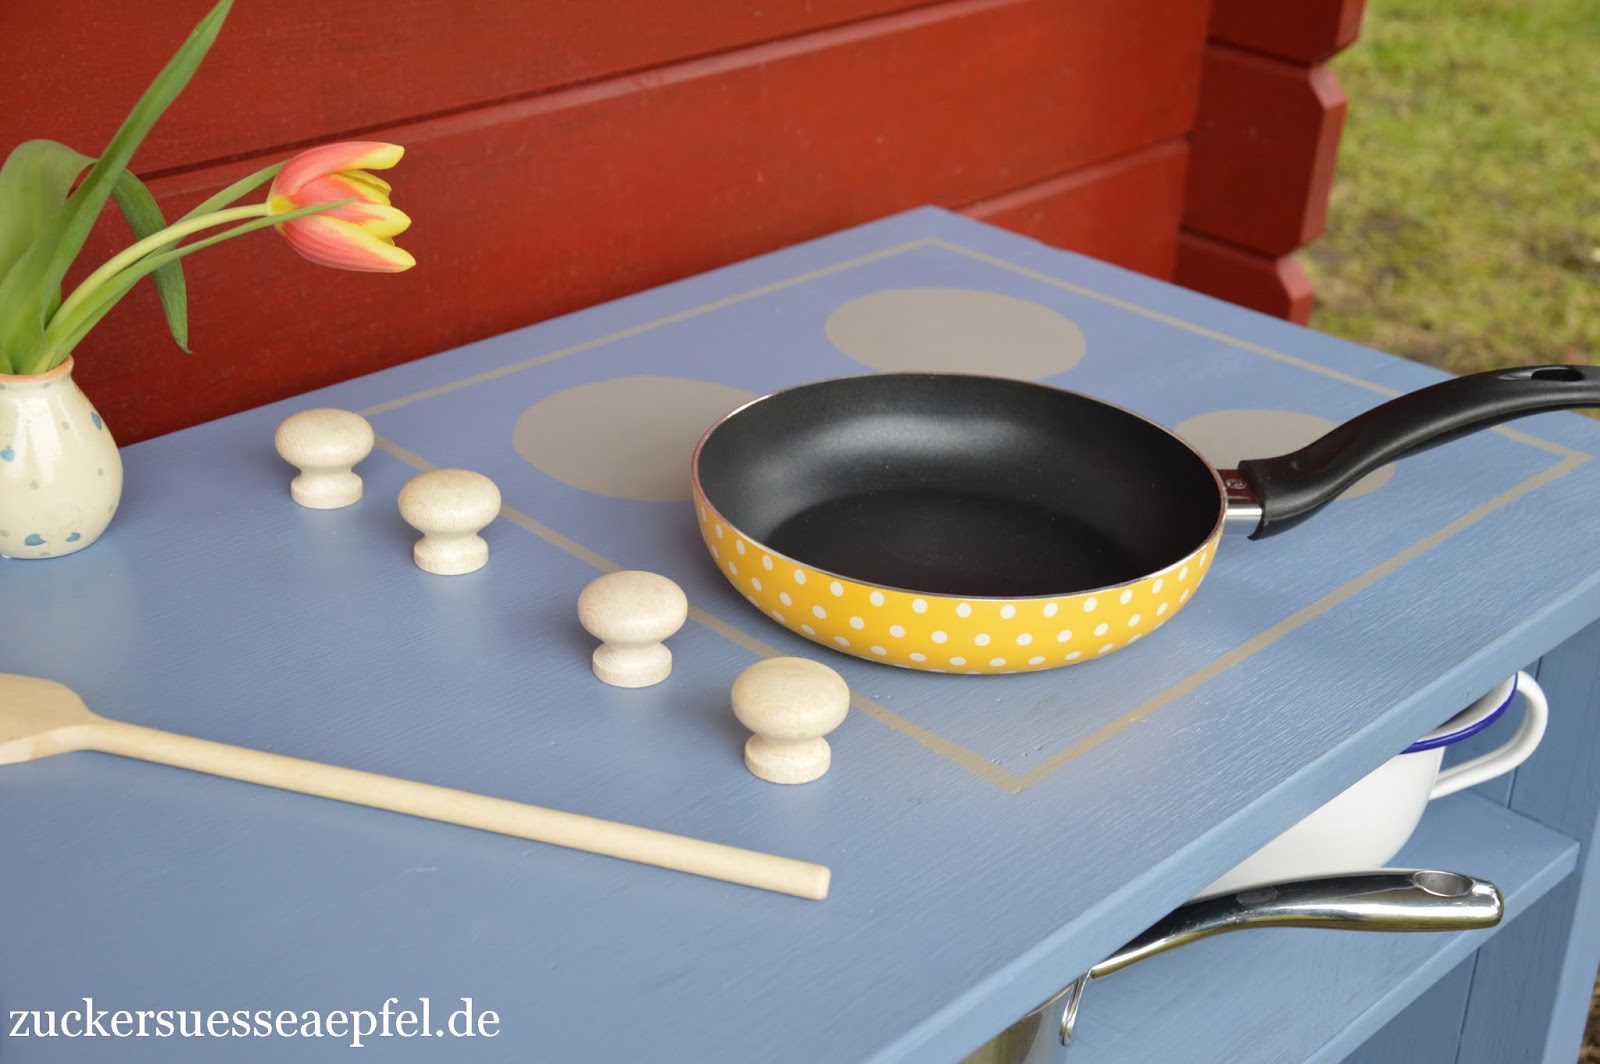 ♥ Zuckersüße Äpfel - kreativer Familienblog ♥: Eine Matschküche ...